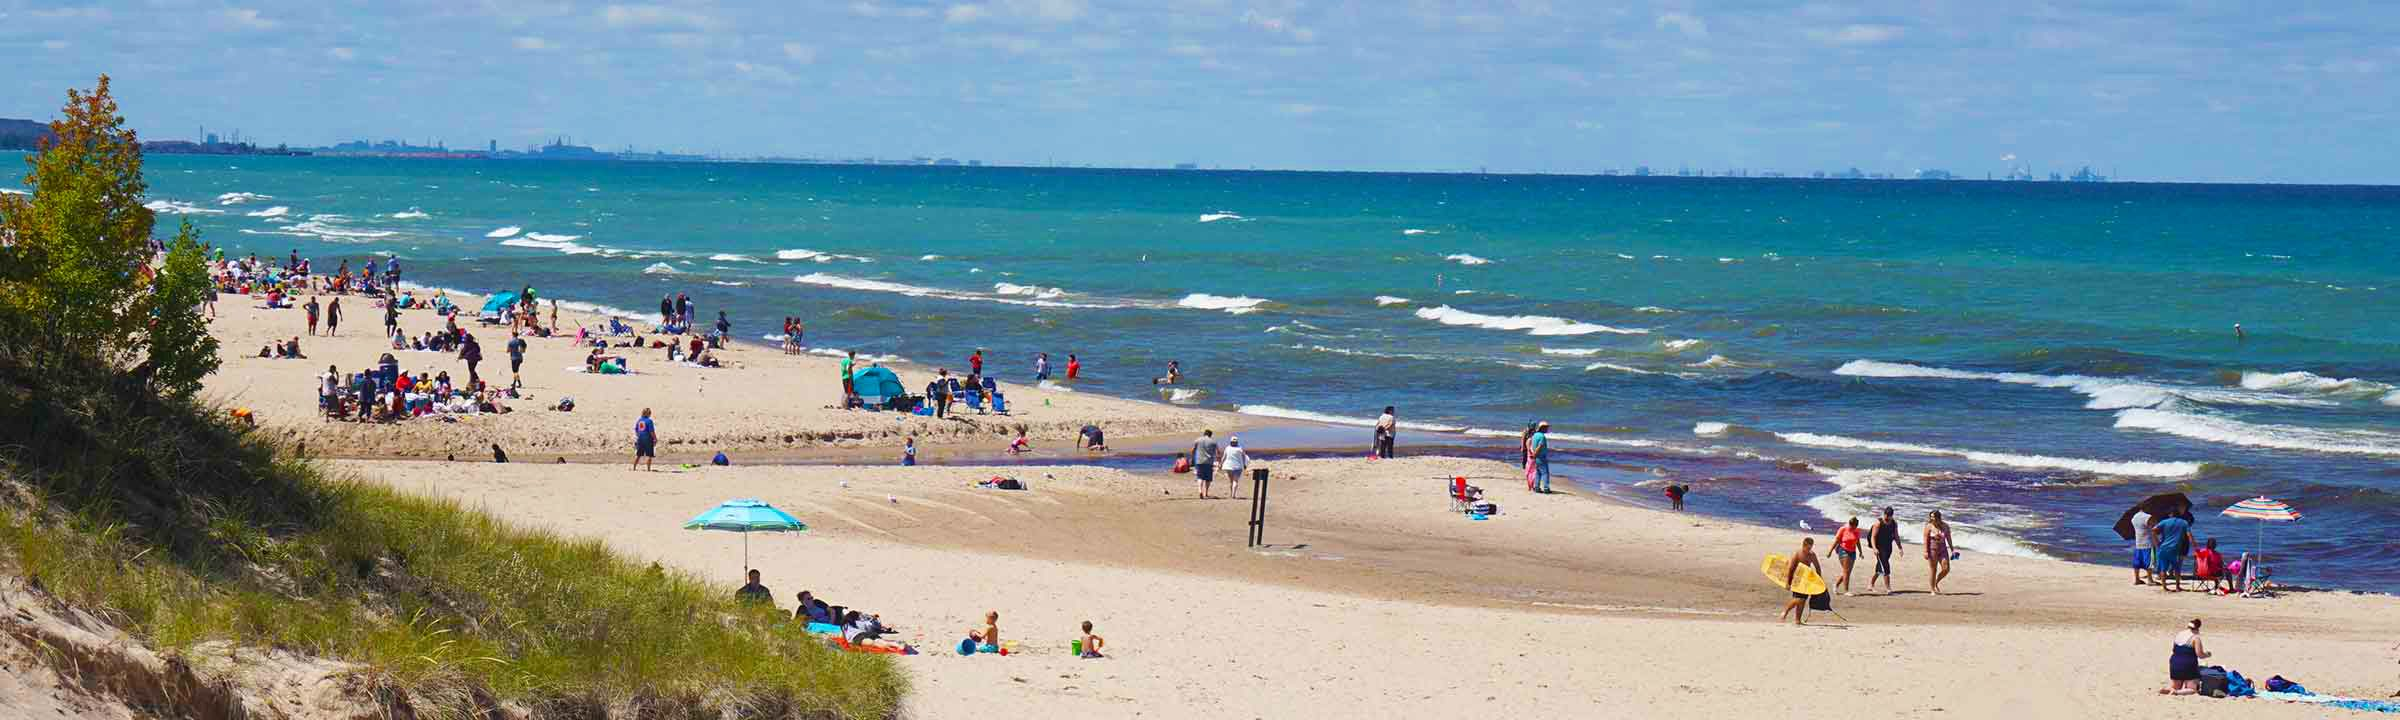 Indiana Dunes Beach Banner Pic